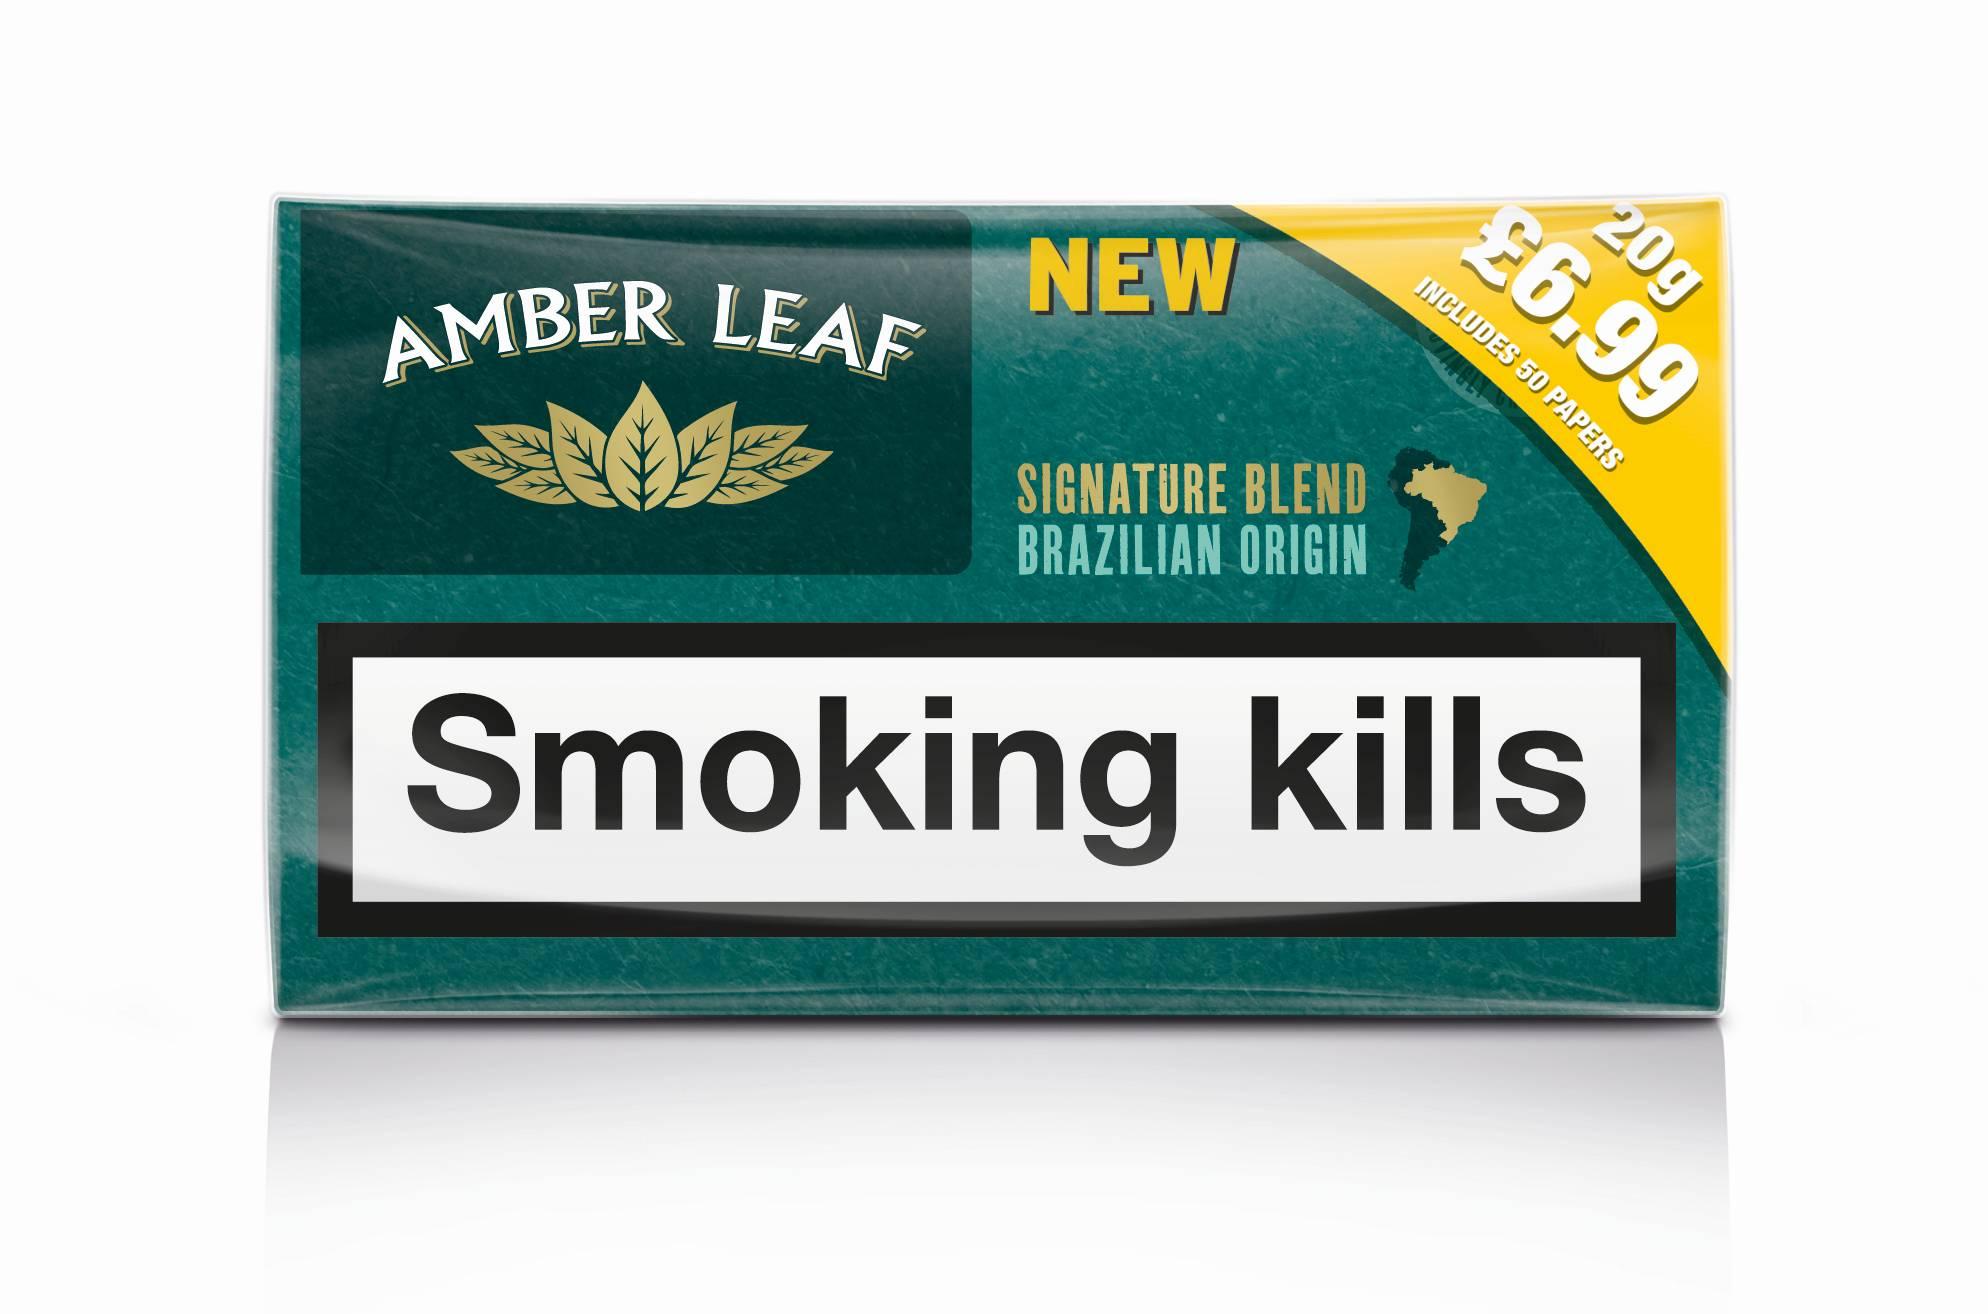 Golden Ticket Promotion For Amber Leaf Retailers